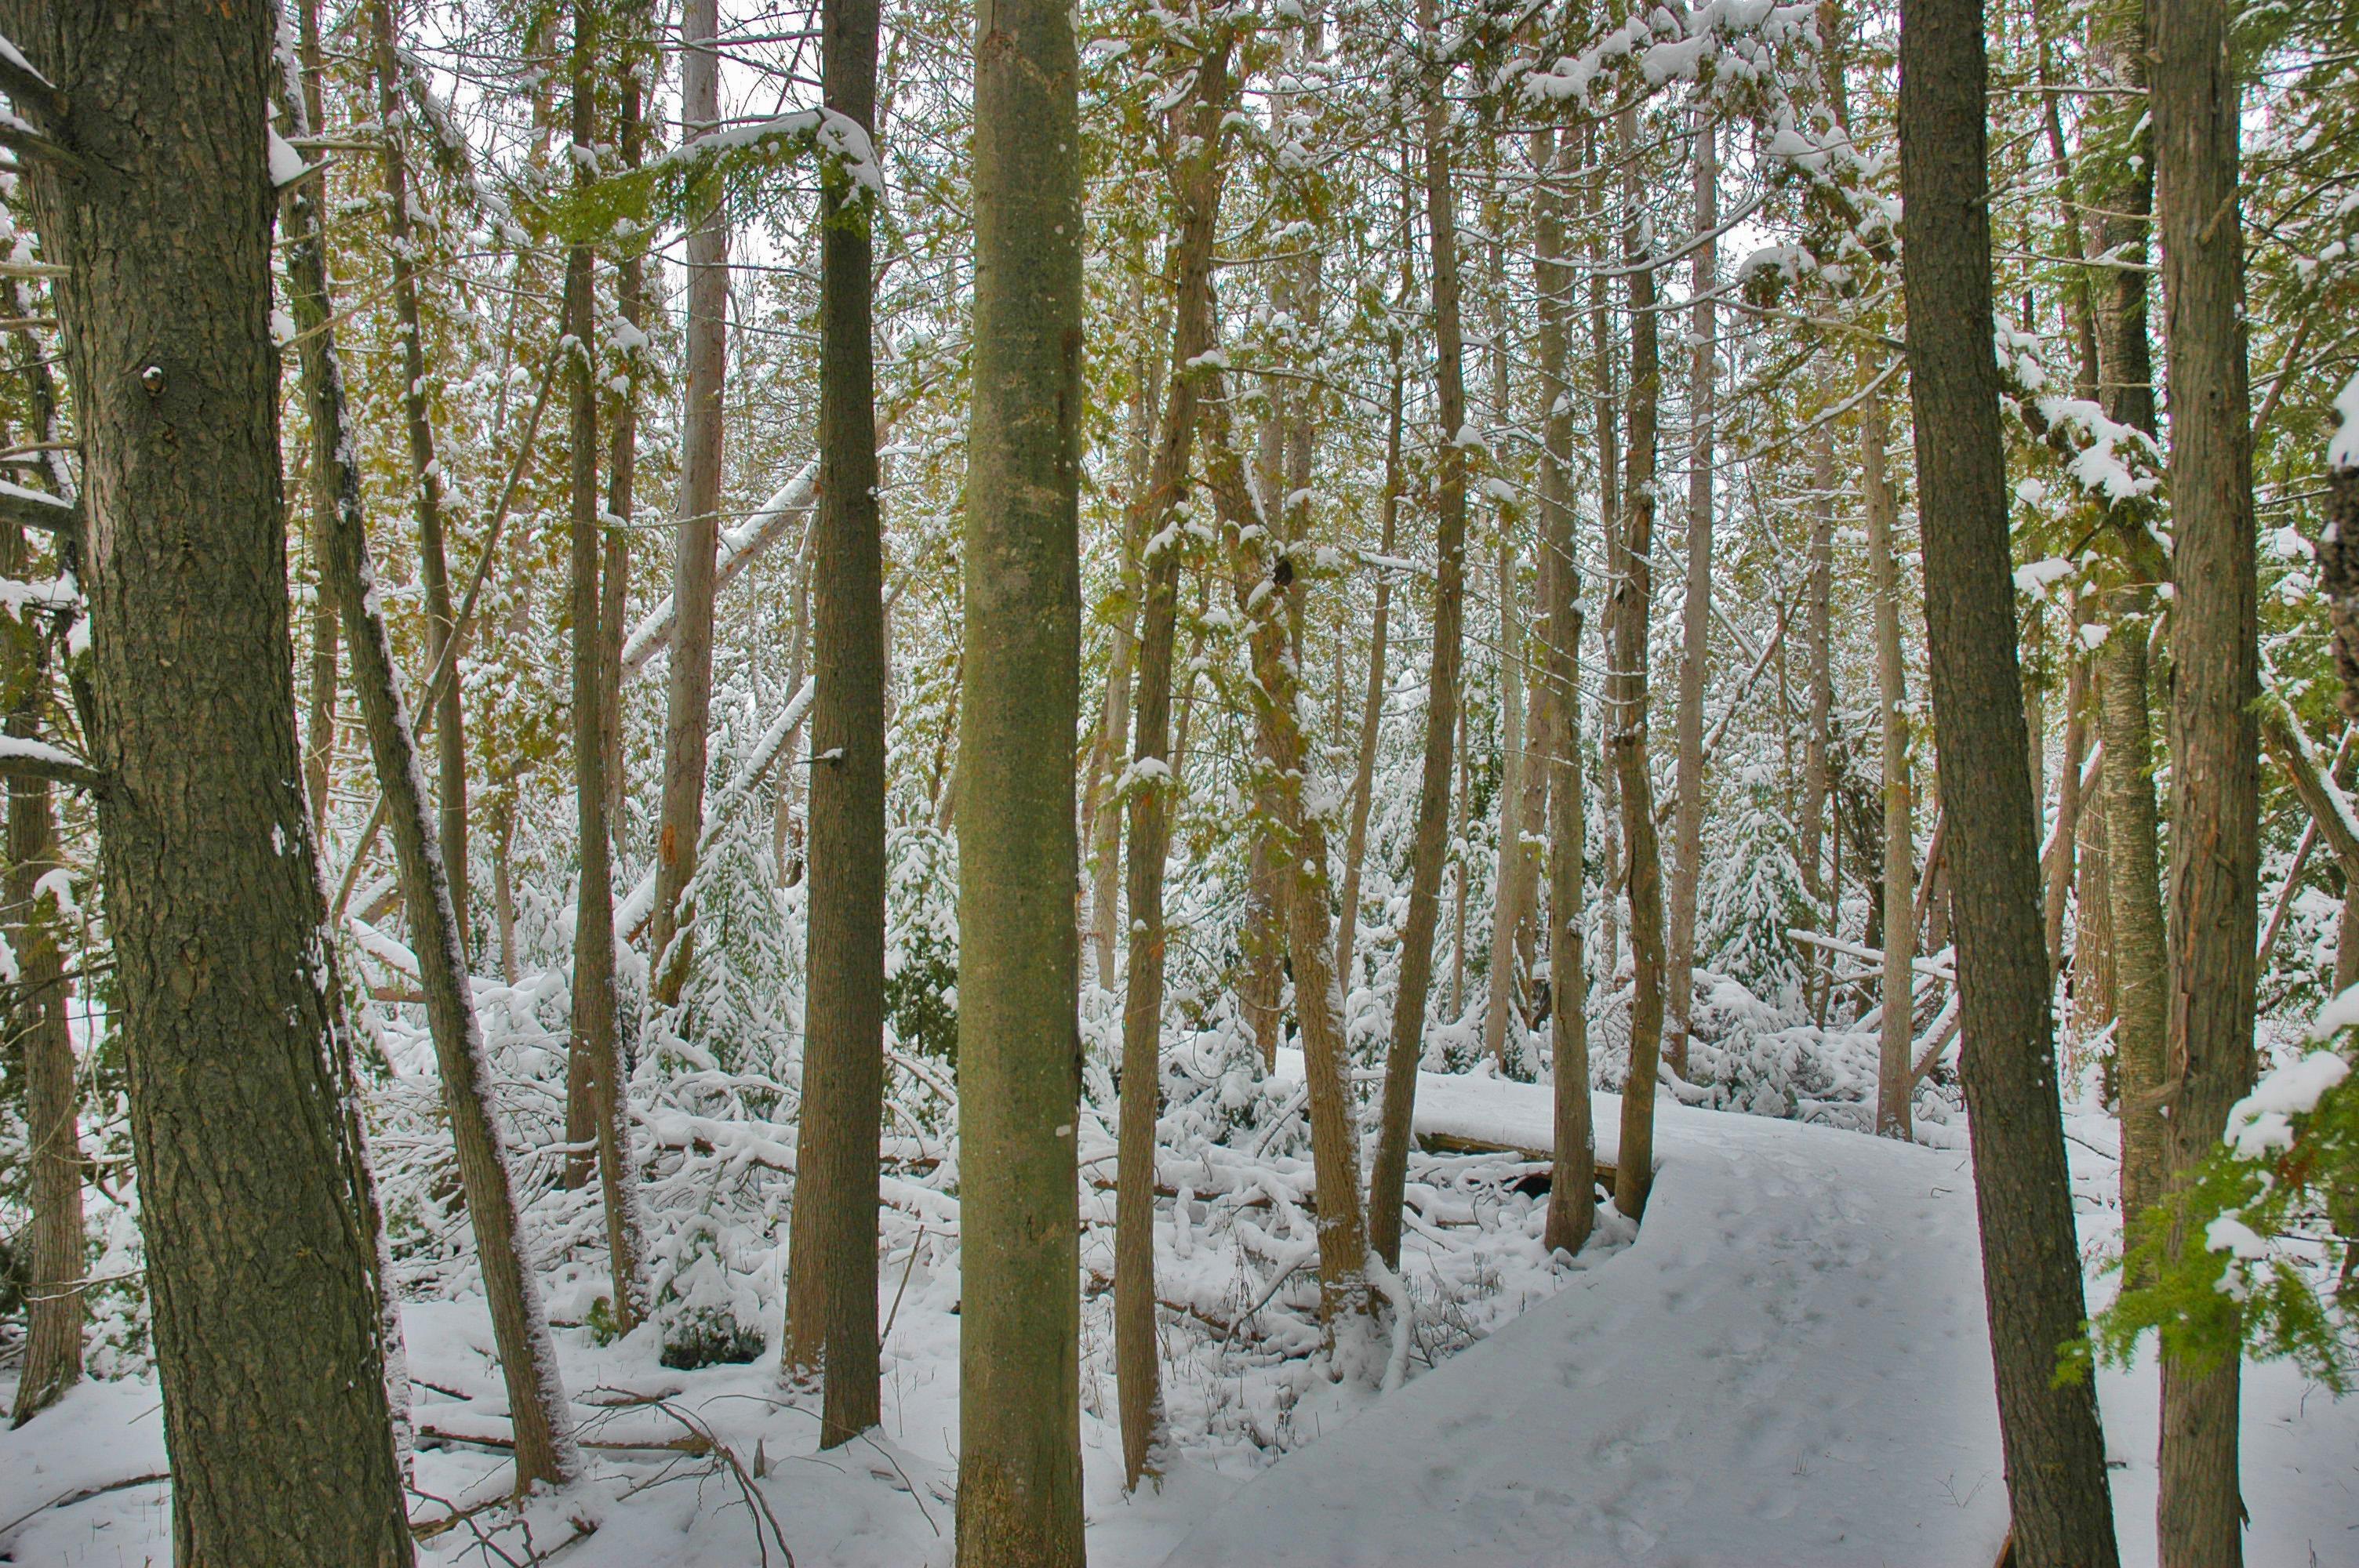 Winter reasserts itself today!